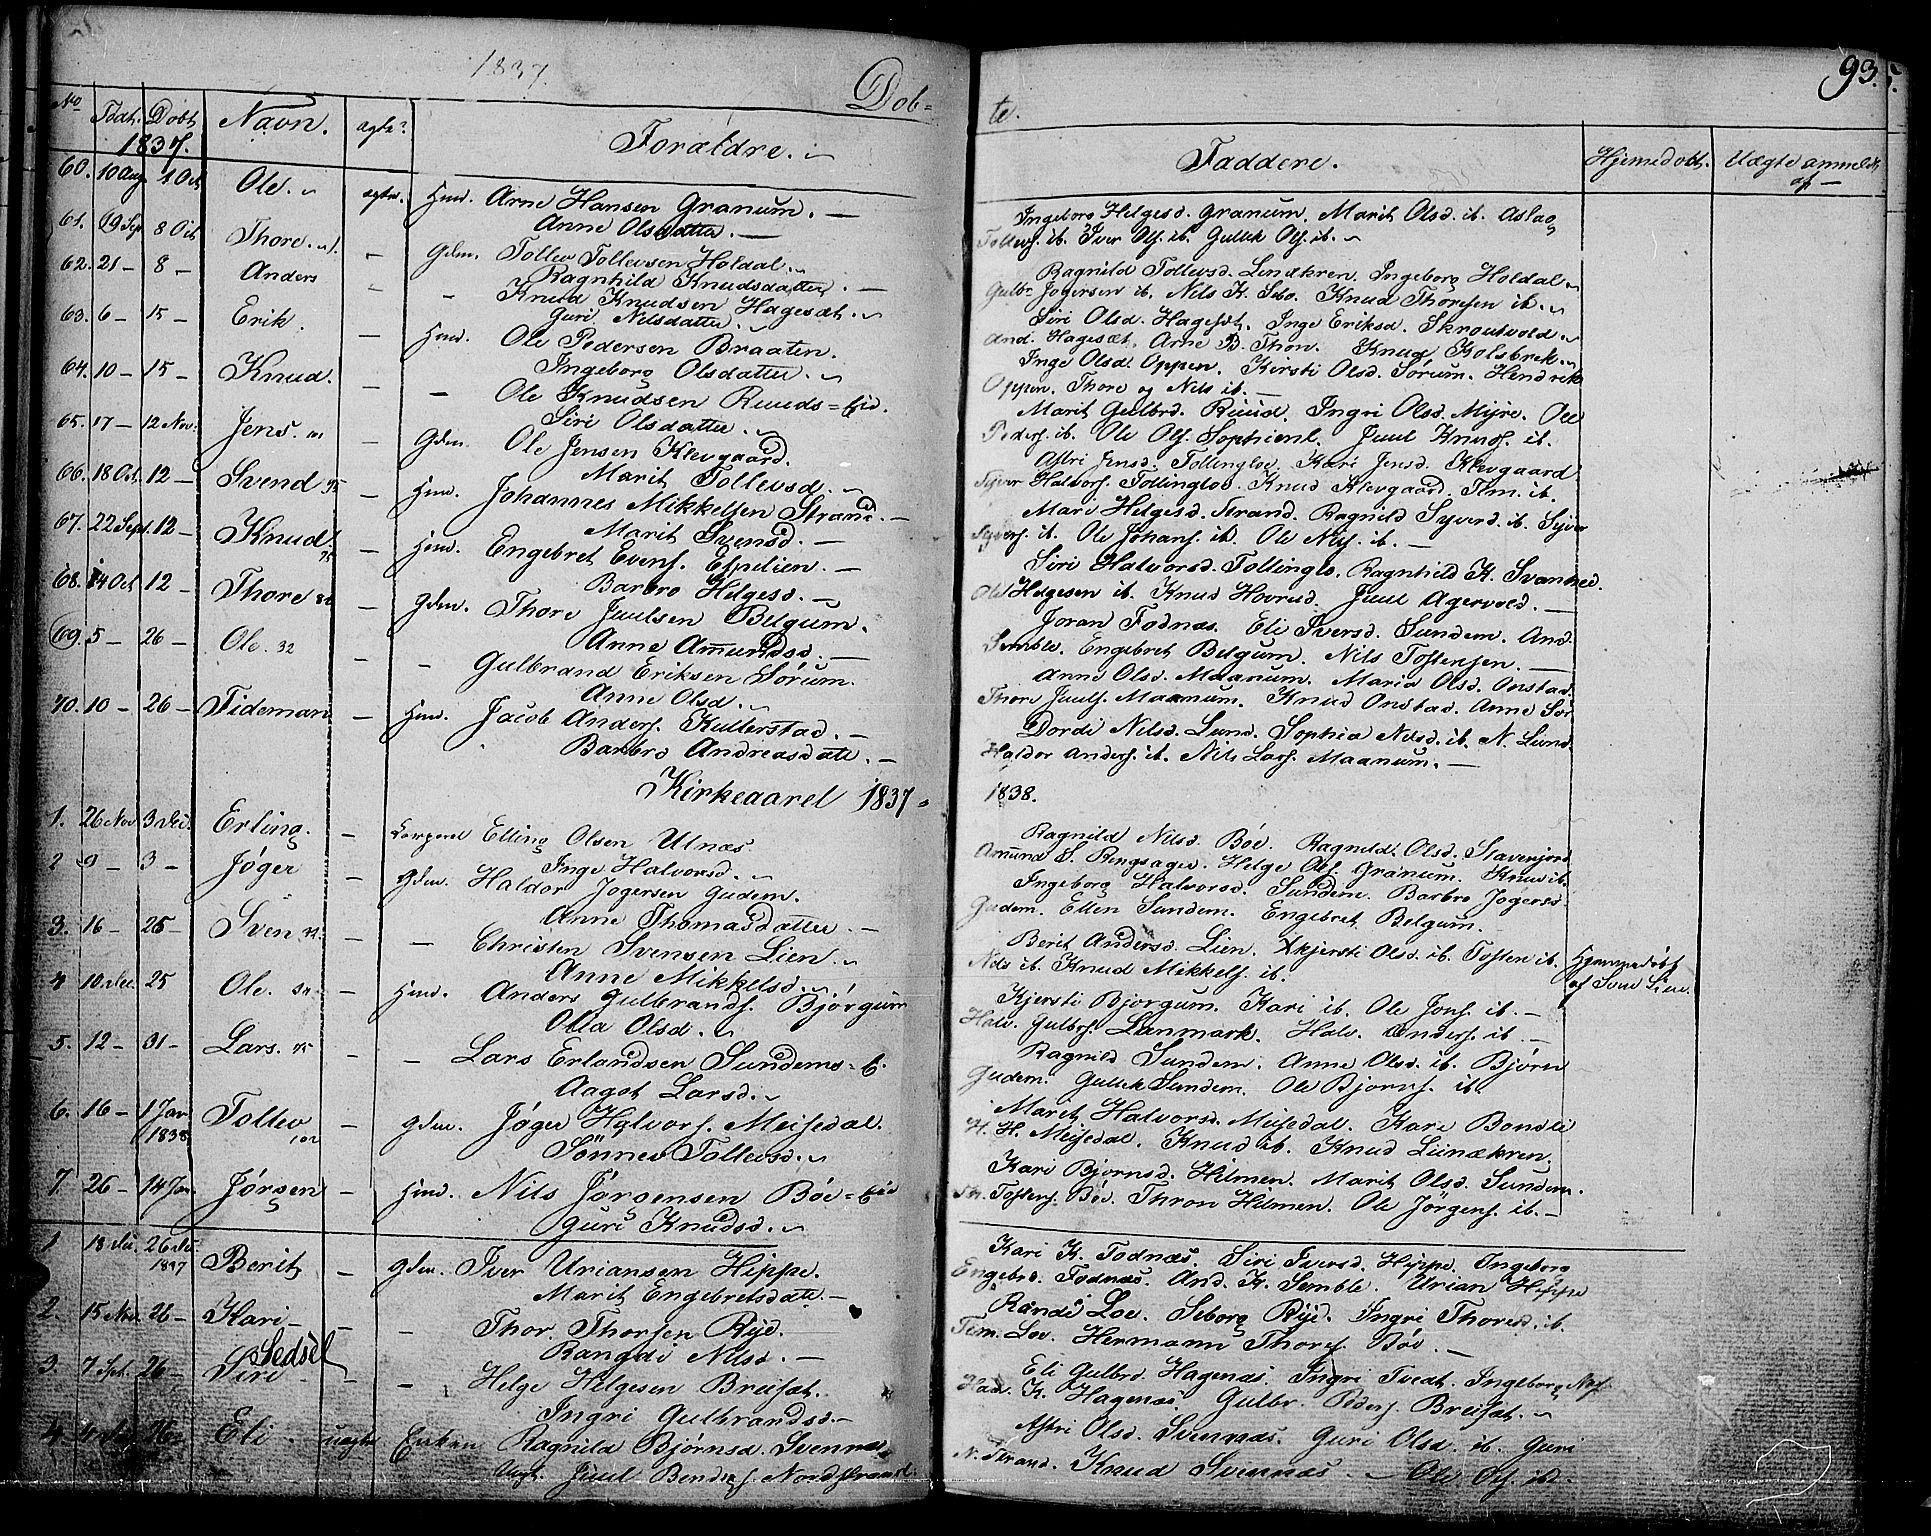 SAH, Nord-Aurdal prestekontor, Ministerialbok nr. 3, 1828-1841, s. 93